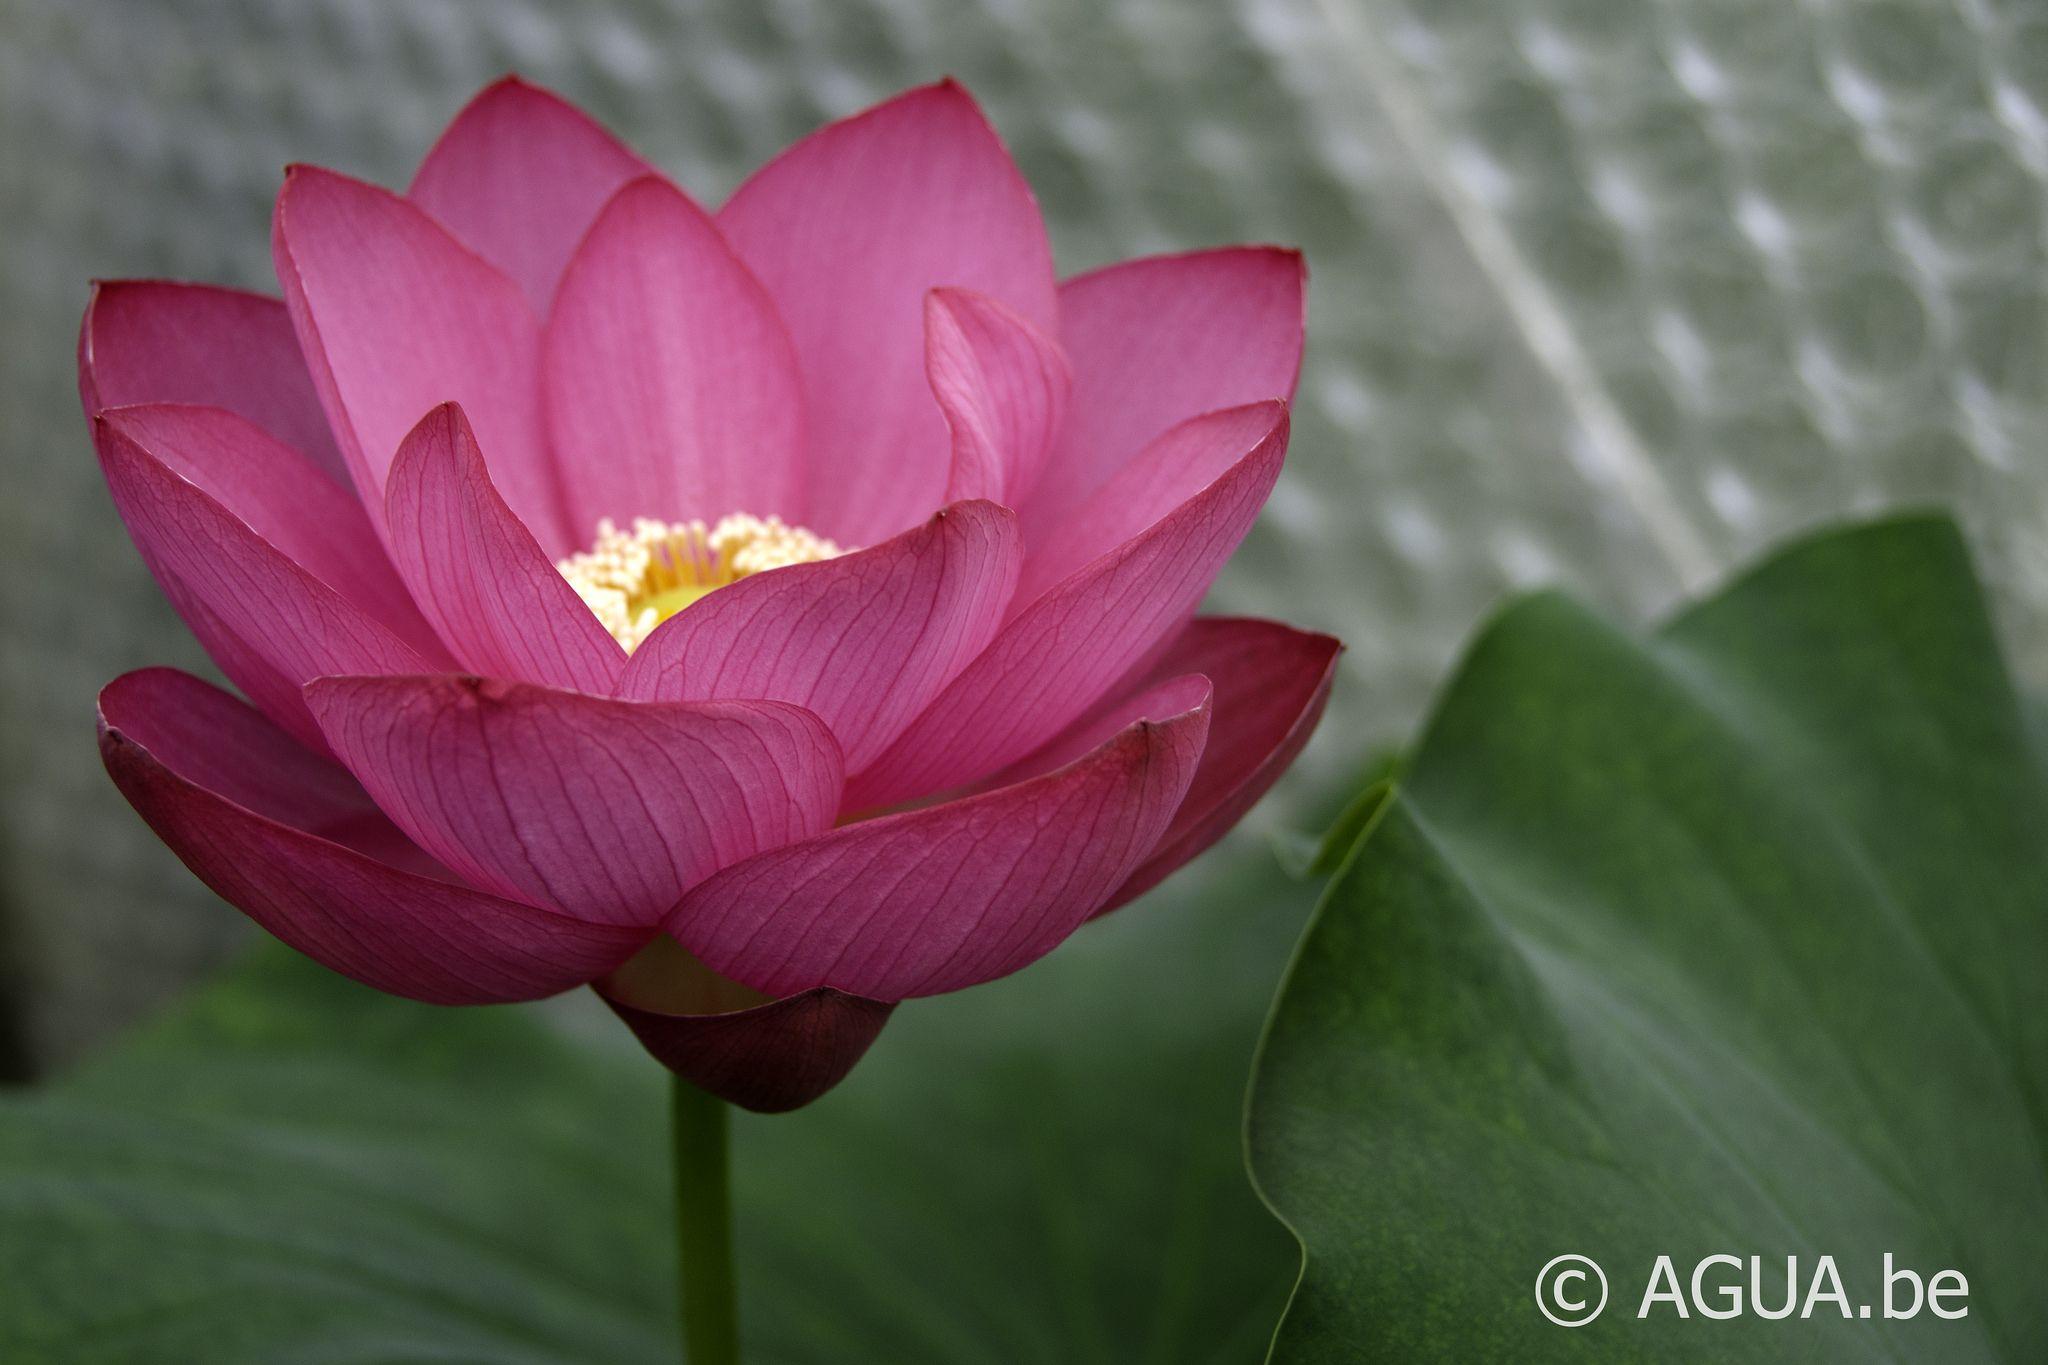 Dsc 0058 Flowers Plants Lotus